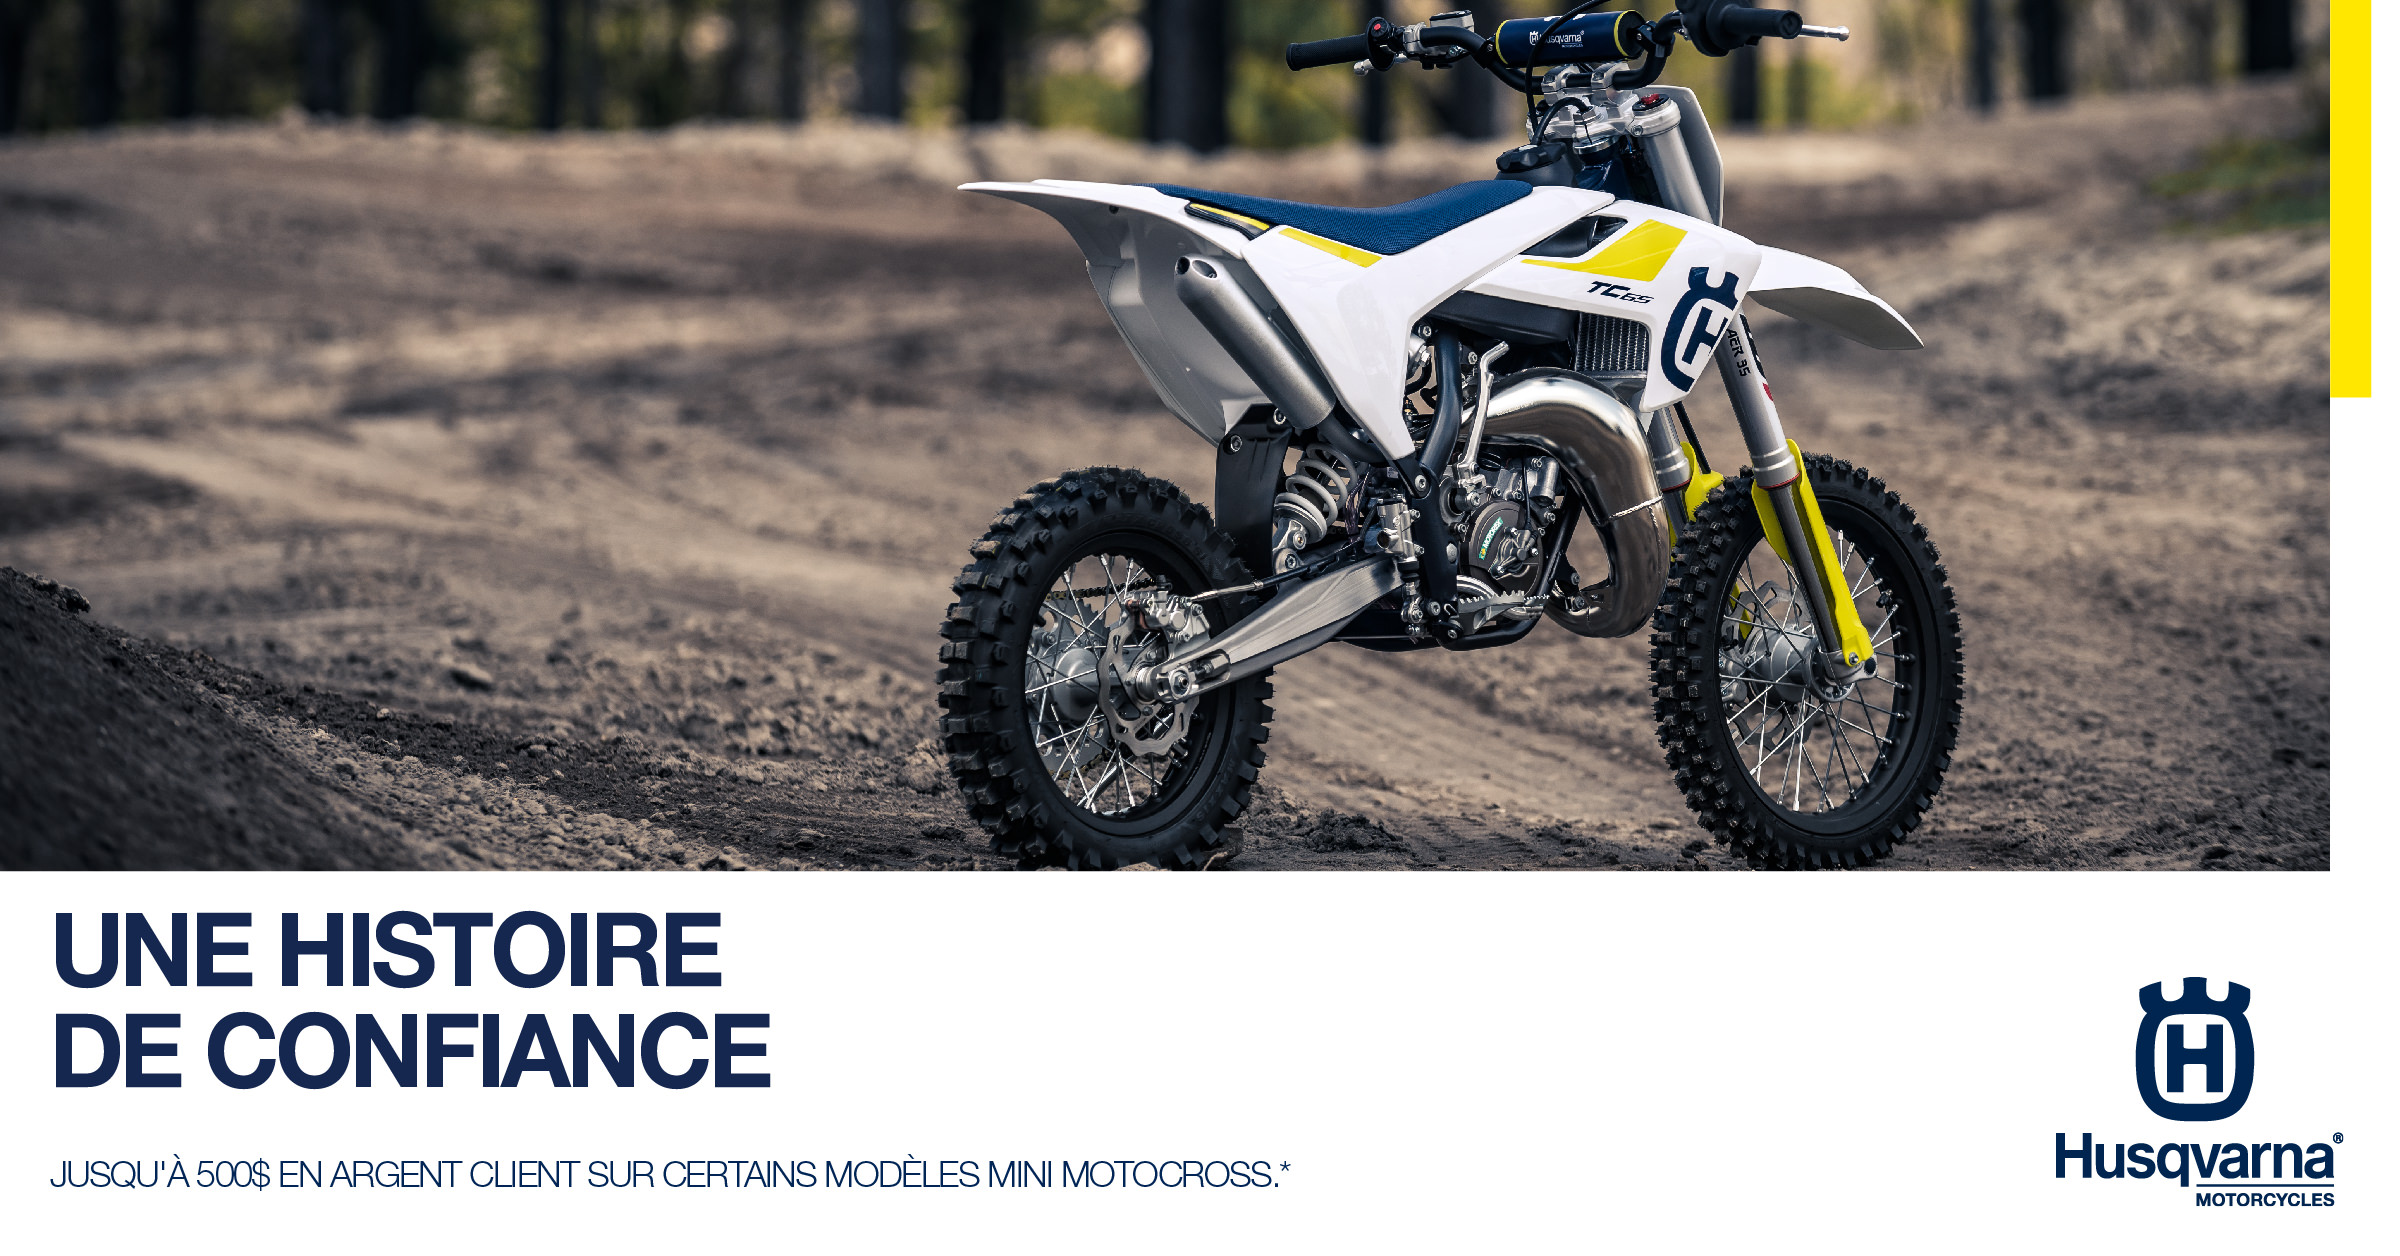 Motocross mini Husqvarna: jusqu'à 500$ en argent client